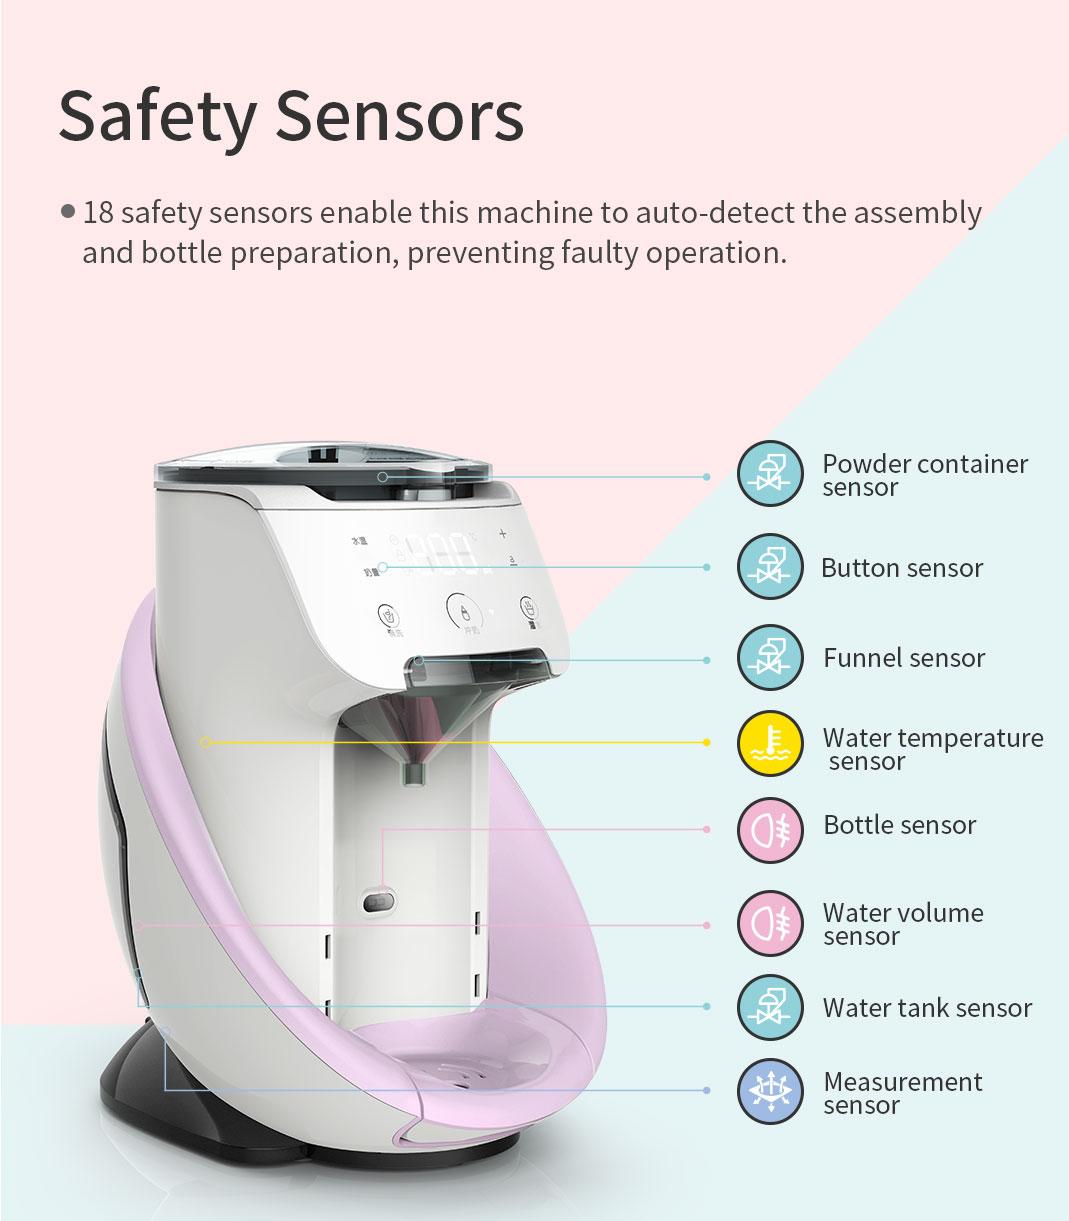 Burabi Baby Formula Dispenser Machine, Smart Automatic WiFi App Control baby Formula Milk Mixer Warmer Maker Machine enlarge